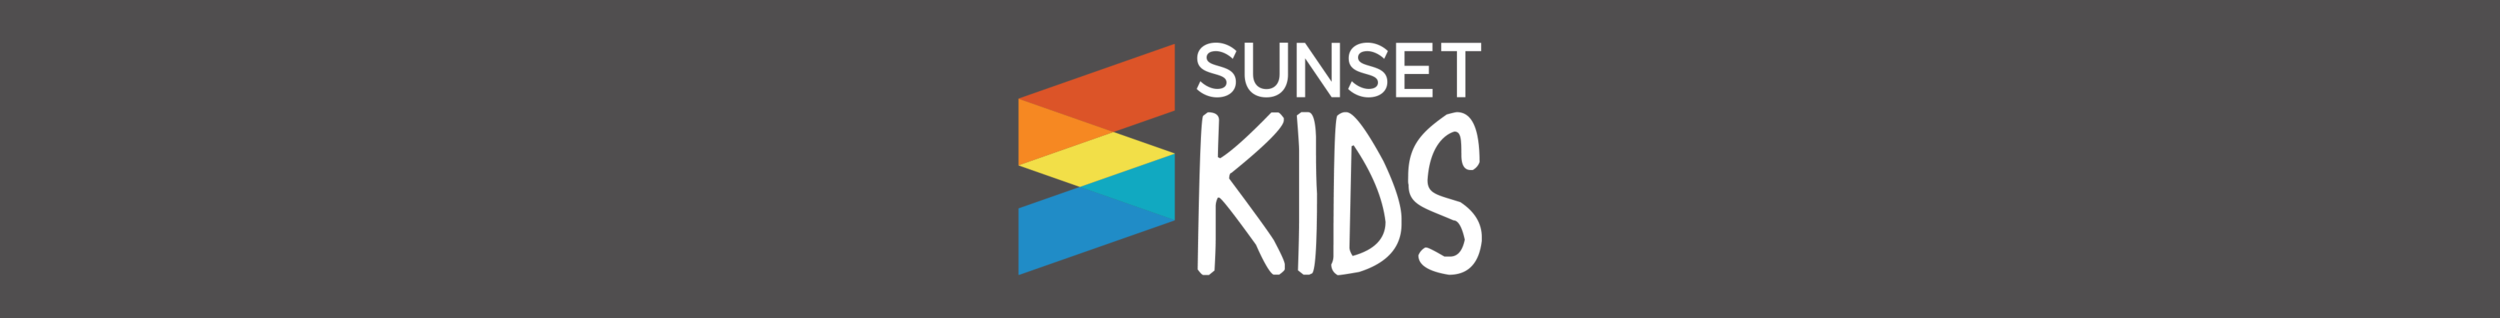 sunset-church-miami-kids.jpg